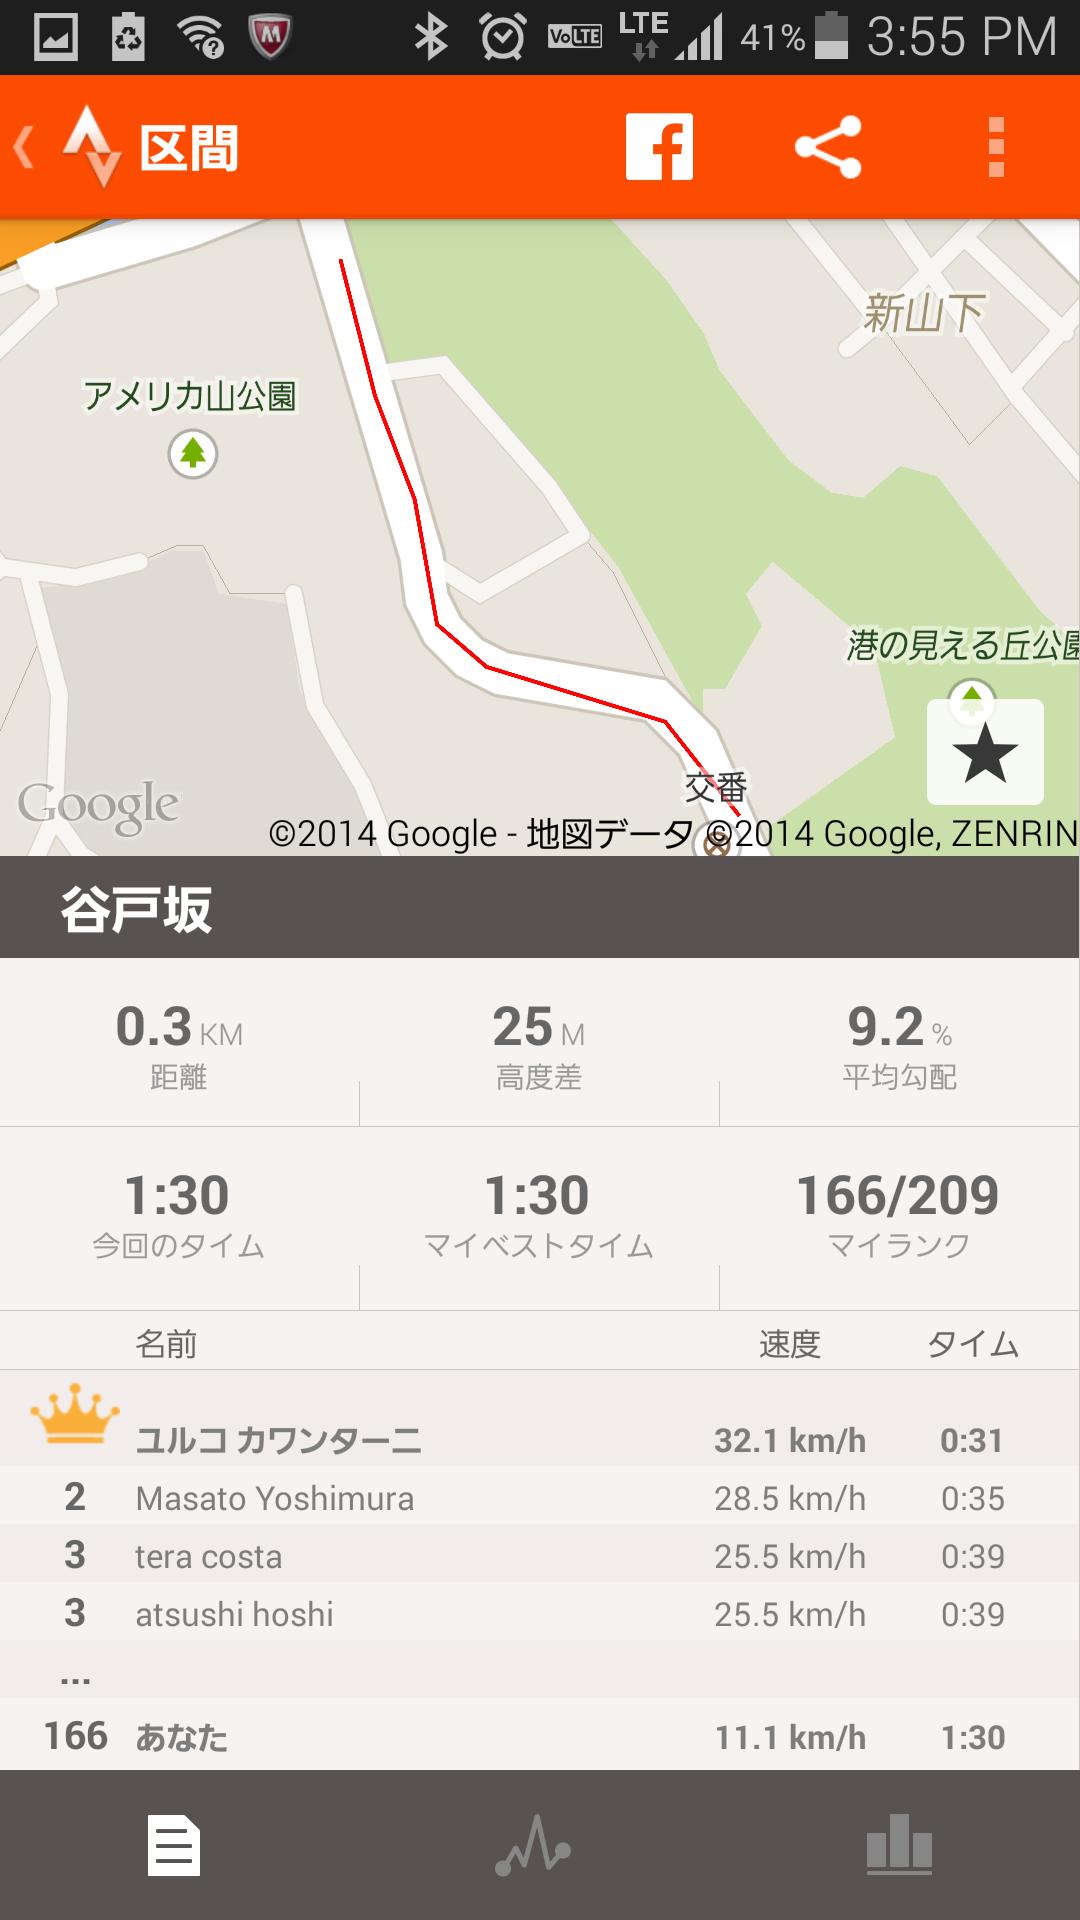 Screenshot_2014-12-17-15-55-51.png